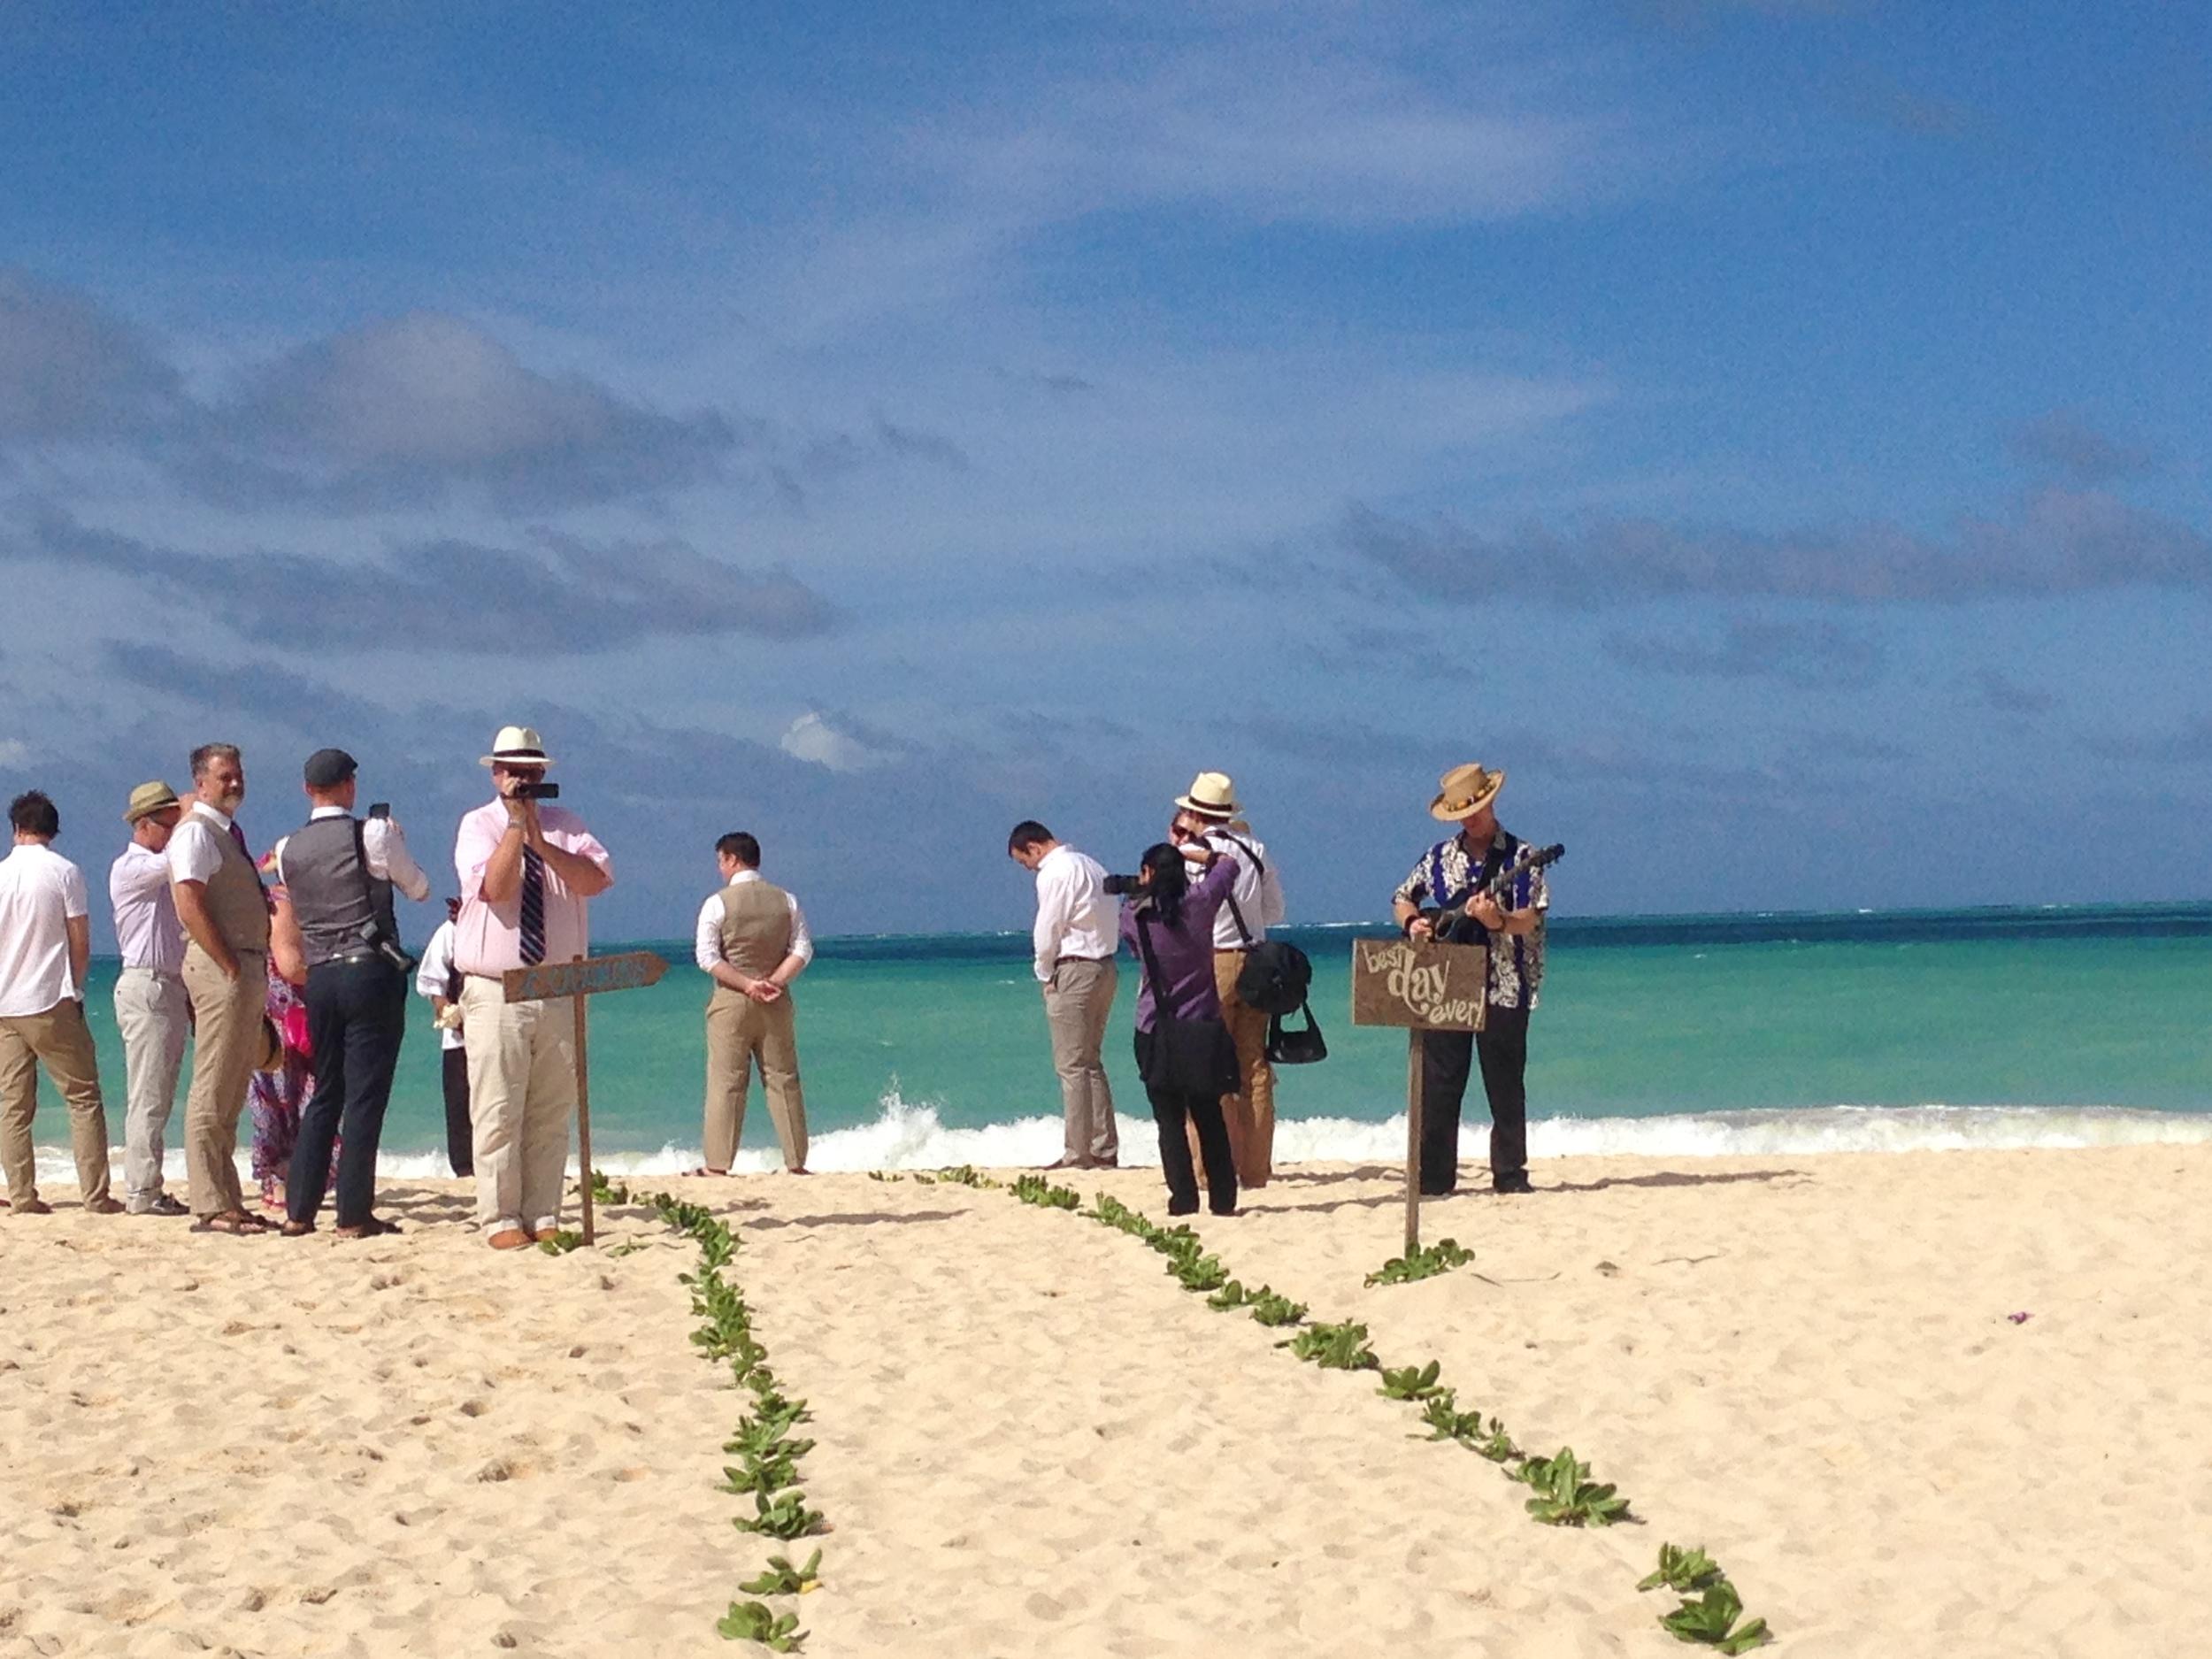 destination-beach-hawaii-wedding-1.JPG